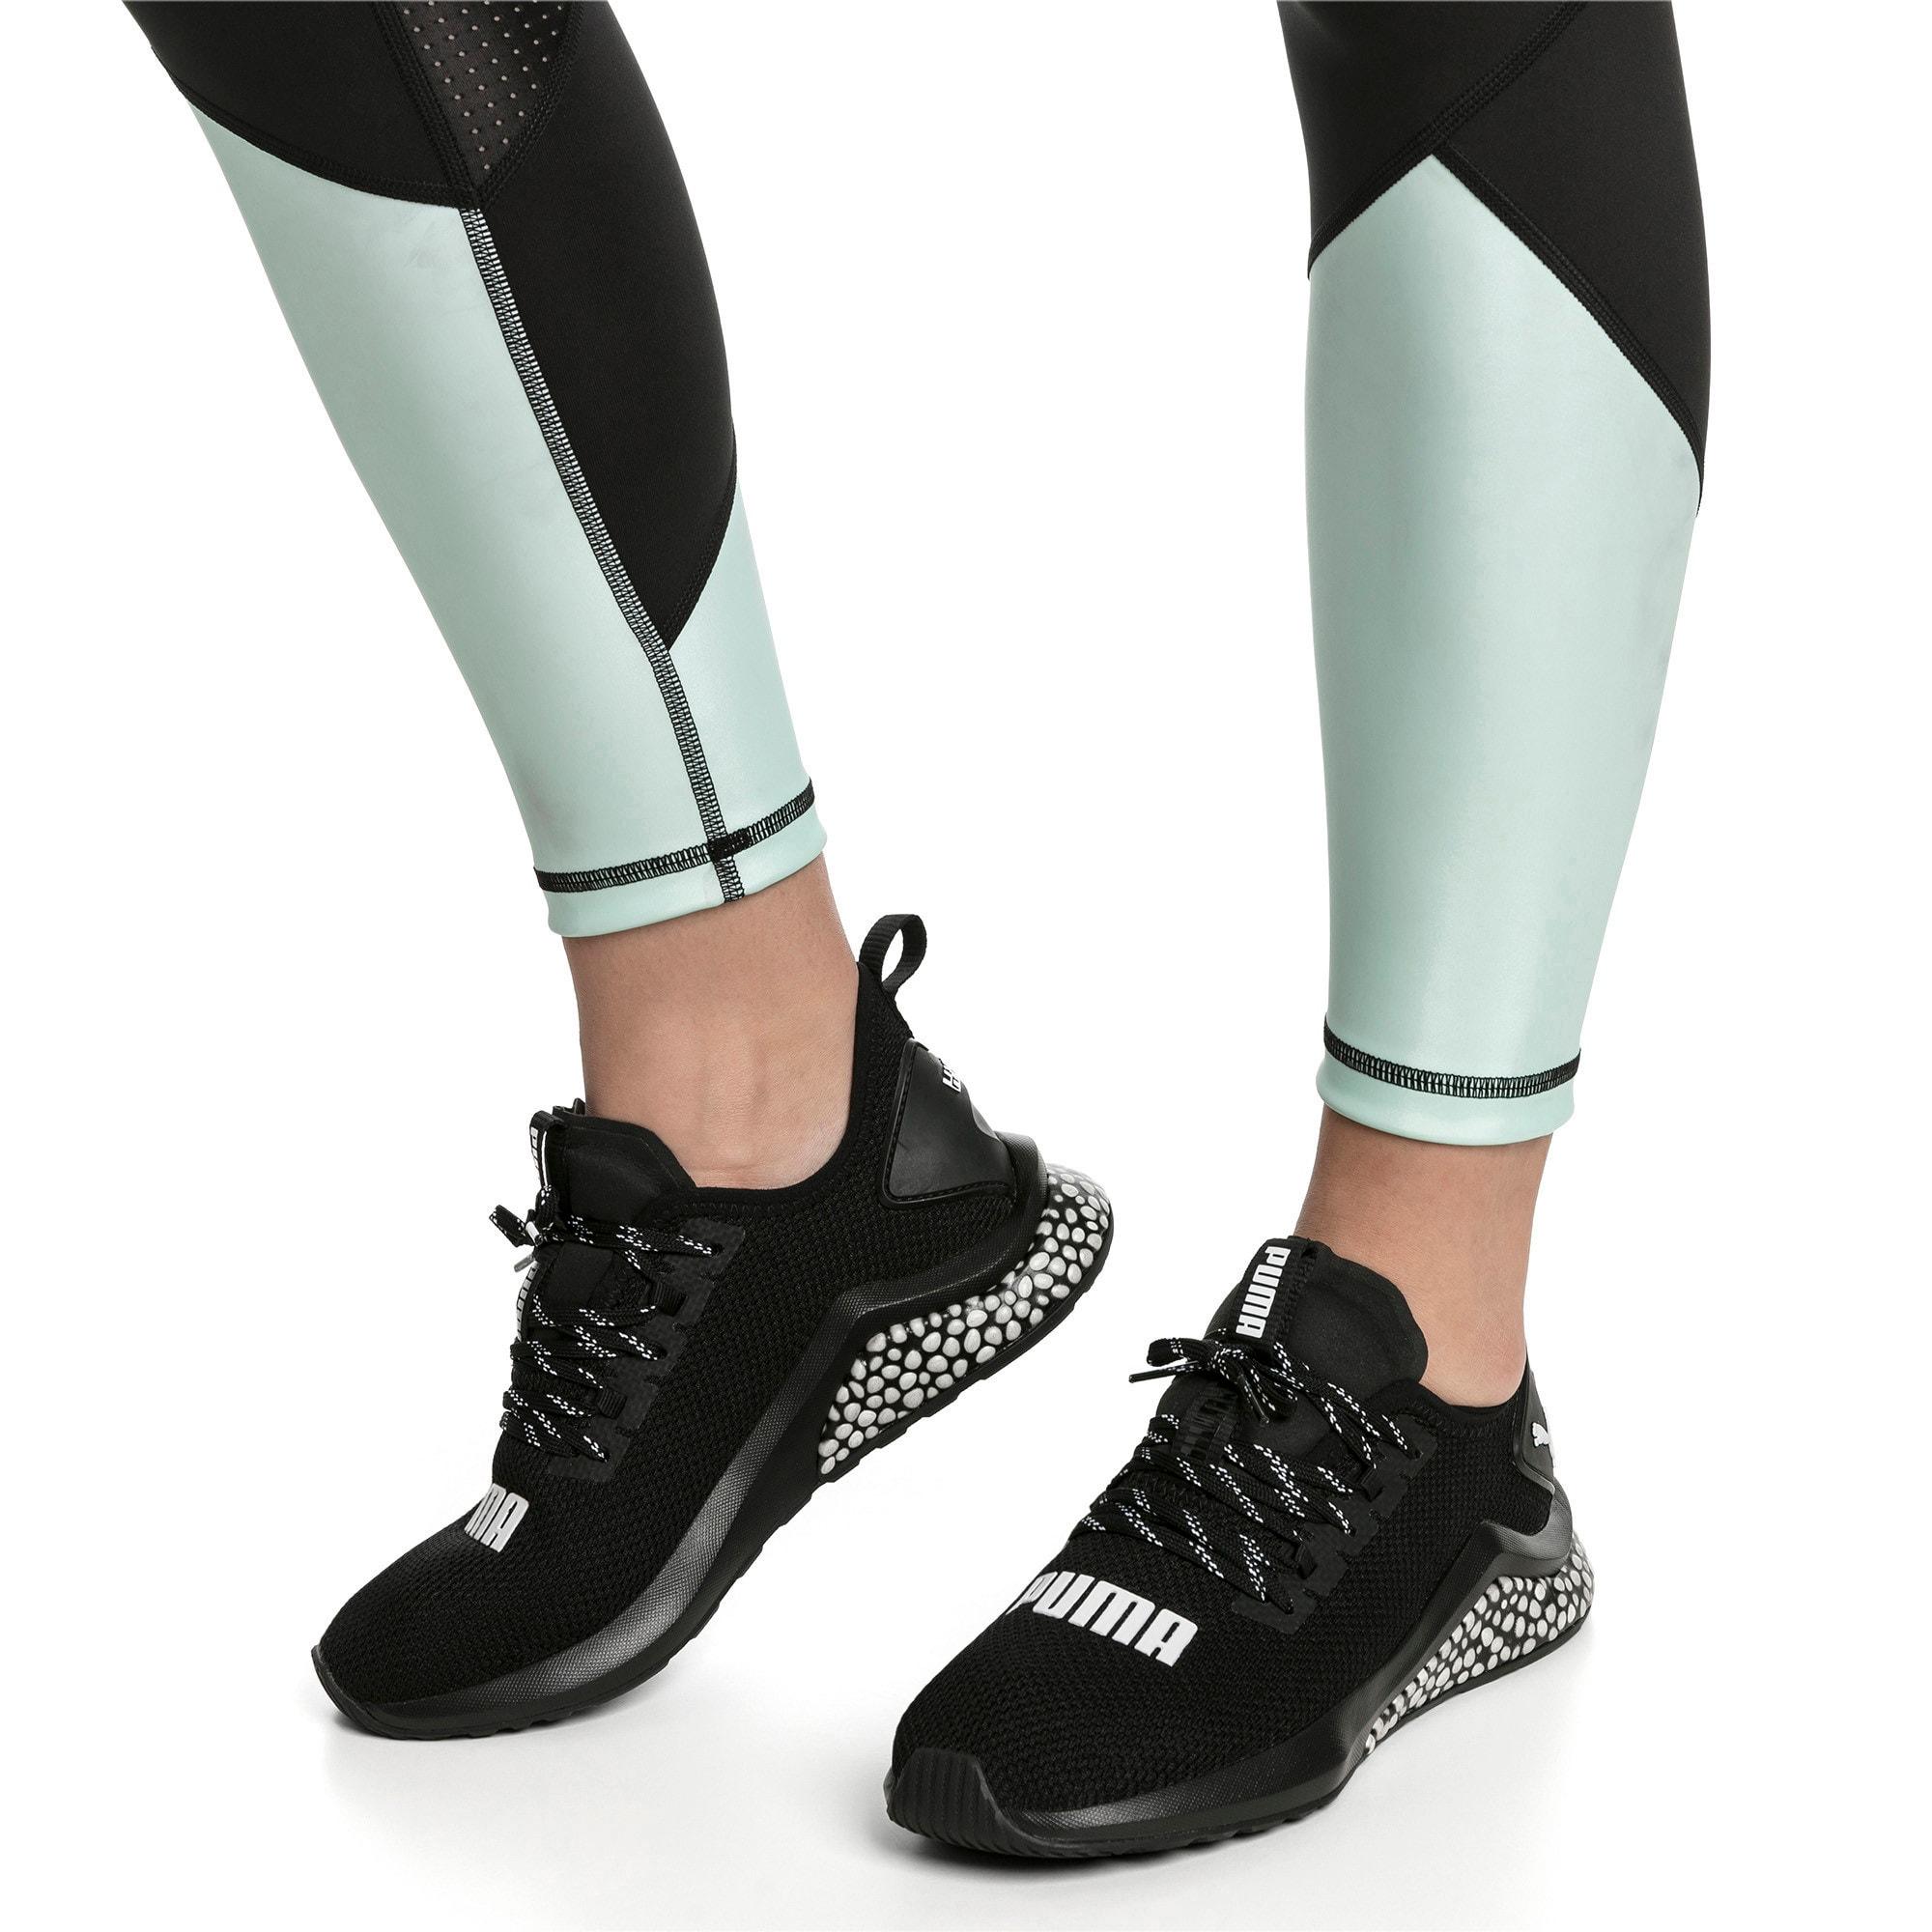 Thumbnail 2 of Chaussure de course HYRID NX pour femme, Puma Black-Puma White, medium